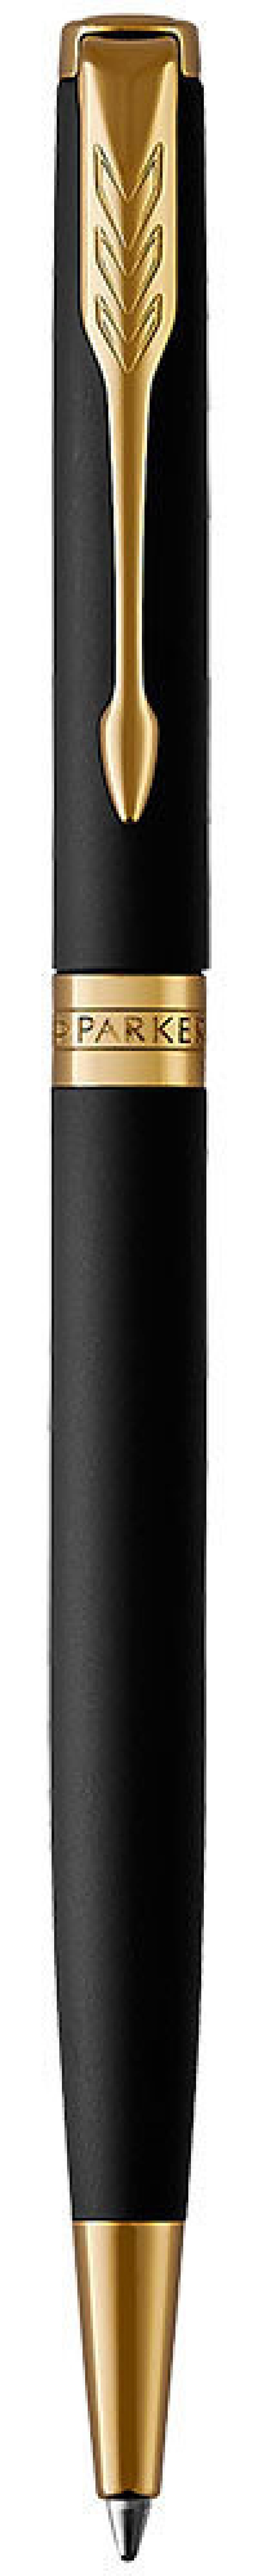 Шариковая ручка поворотная Parker Sonnet Core K428 Slim Matte Black GT черный M 1931520 шариковая ручка поворотная parker sonnet core k527 stainless steel gt черный m 1931507